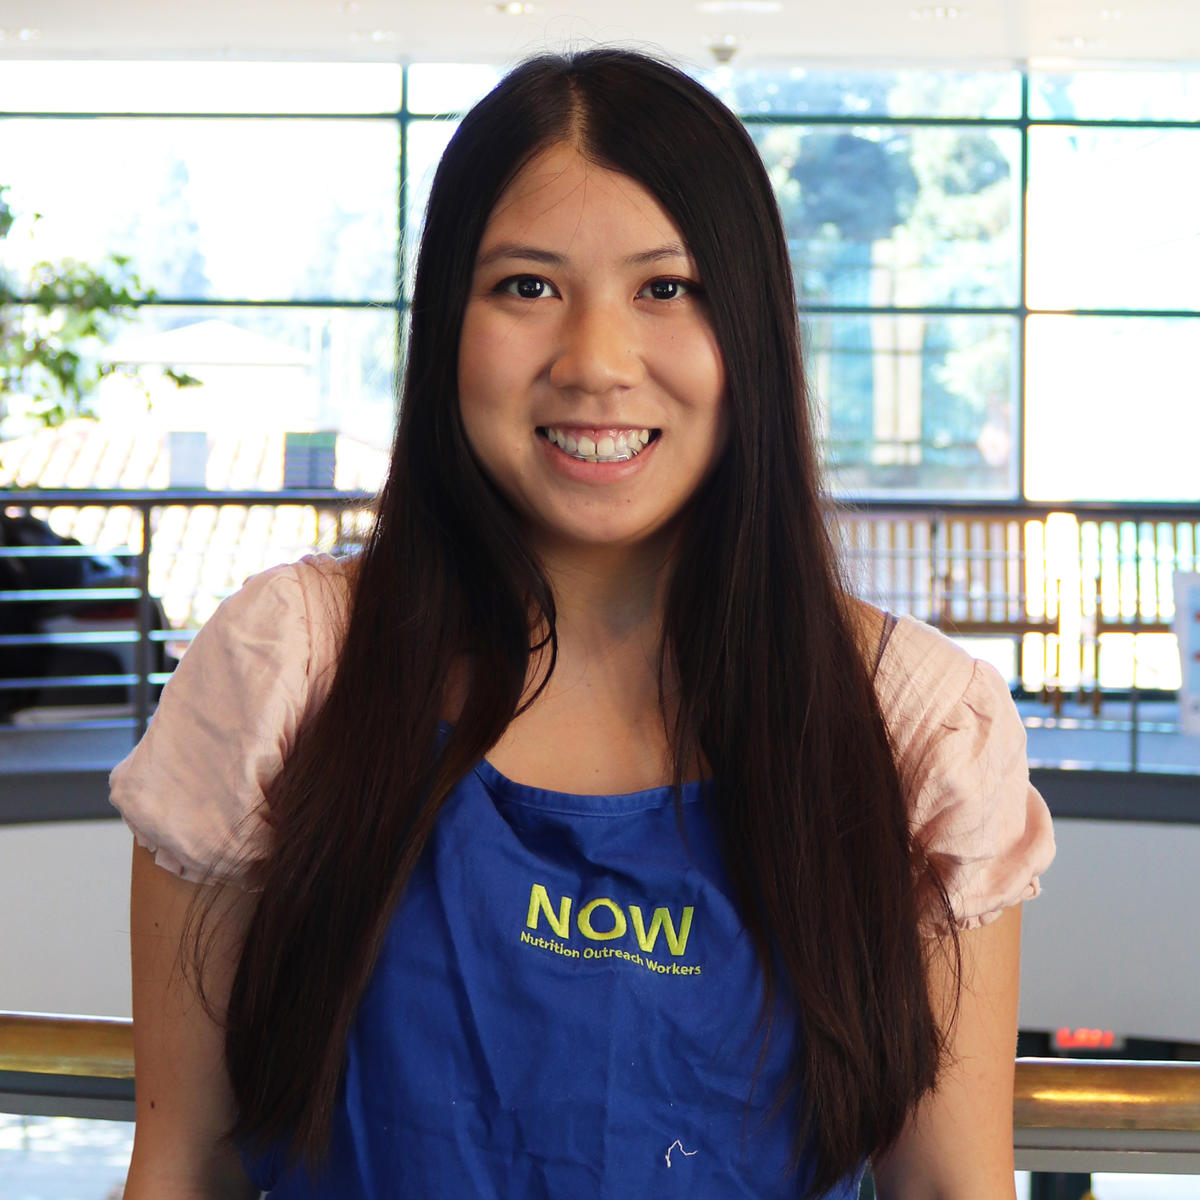 Nutrition Outreach Worker, Kim